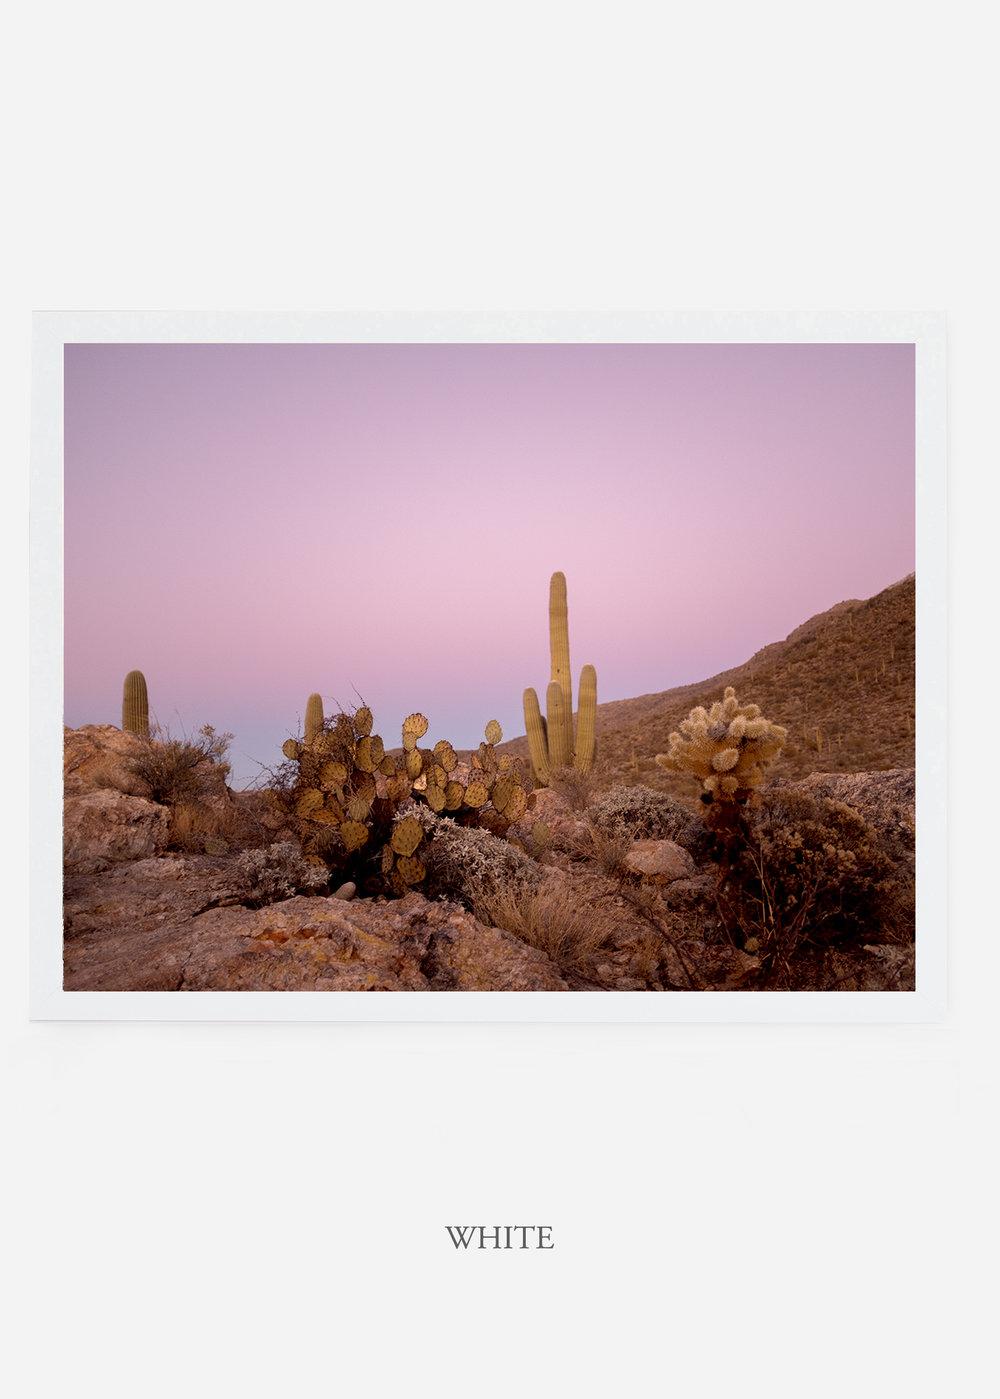 nomat_whiteframe-saguaroNo.9-wildercalifornia-art-wallart-cactusprint-homedecor-prints-arizona-botanical-artwork-interiordesign.jpg